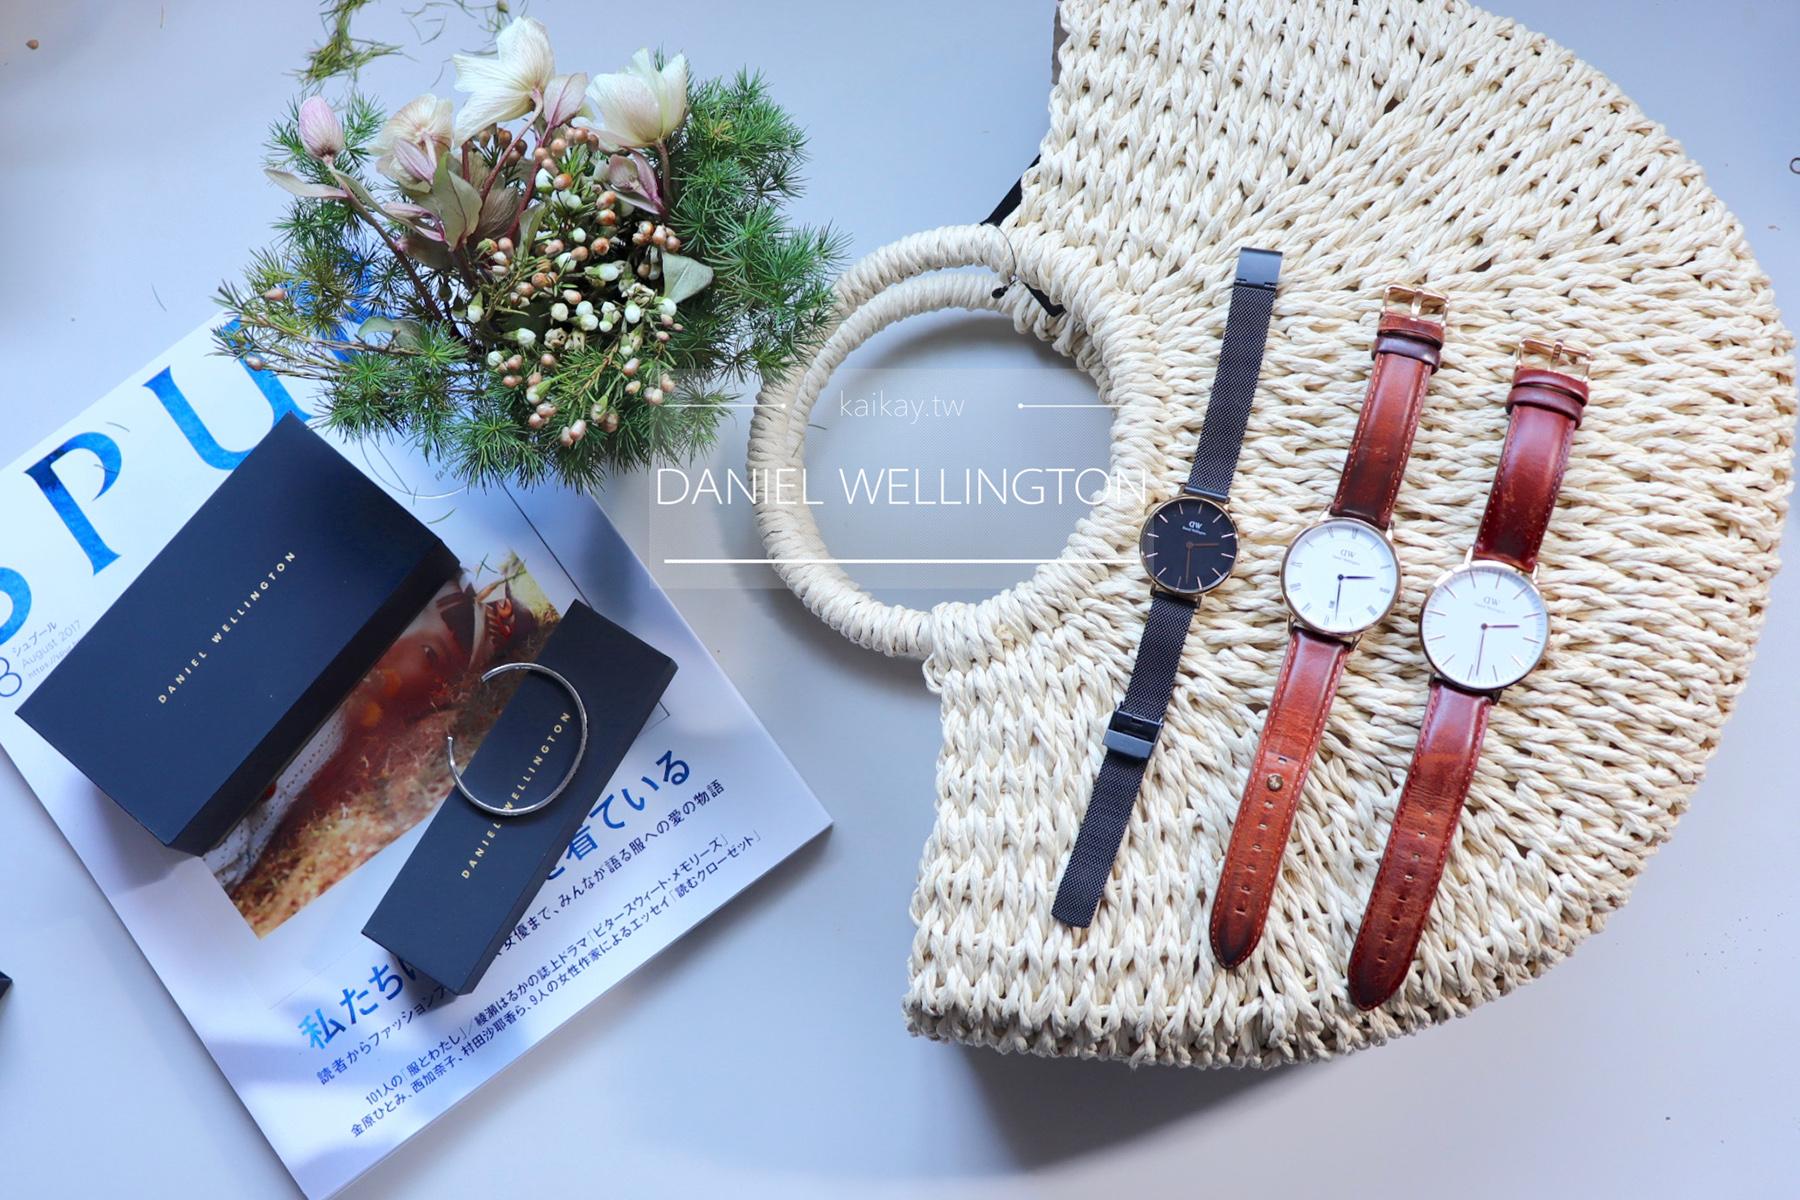 ☆【DW折扣碼】喜歡質感簡約風 一定要入手一隻Daniel Wellington手錶!2021折扣碼:kaikay @凱的日本食尚日記